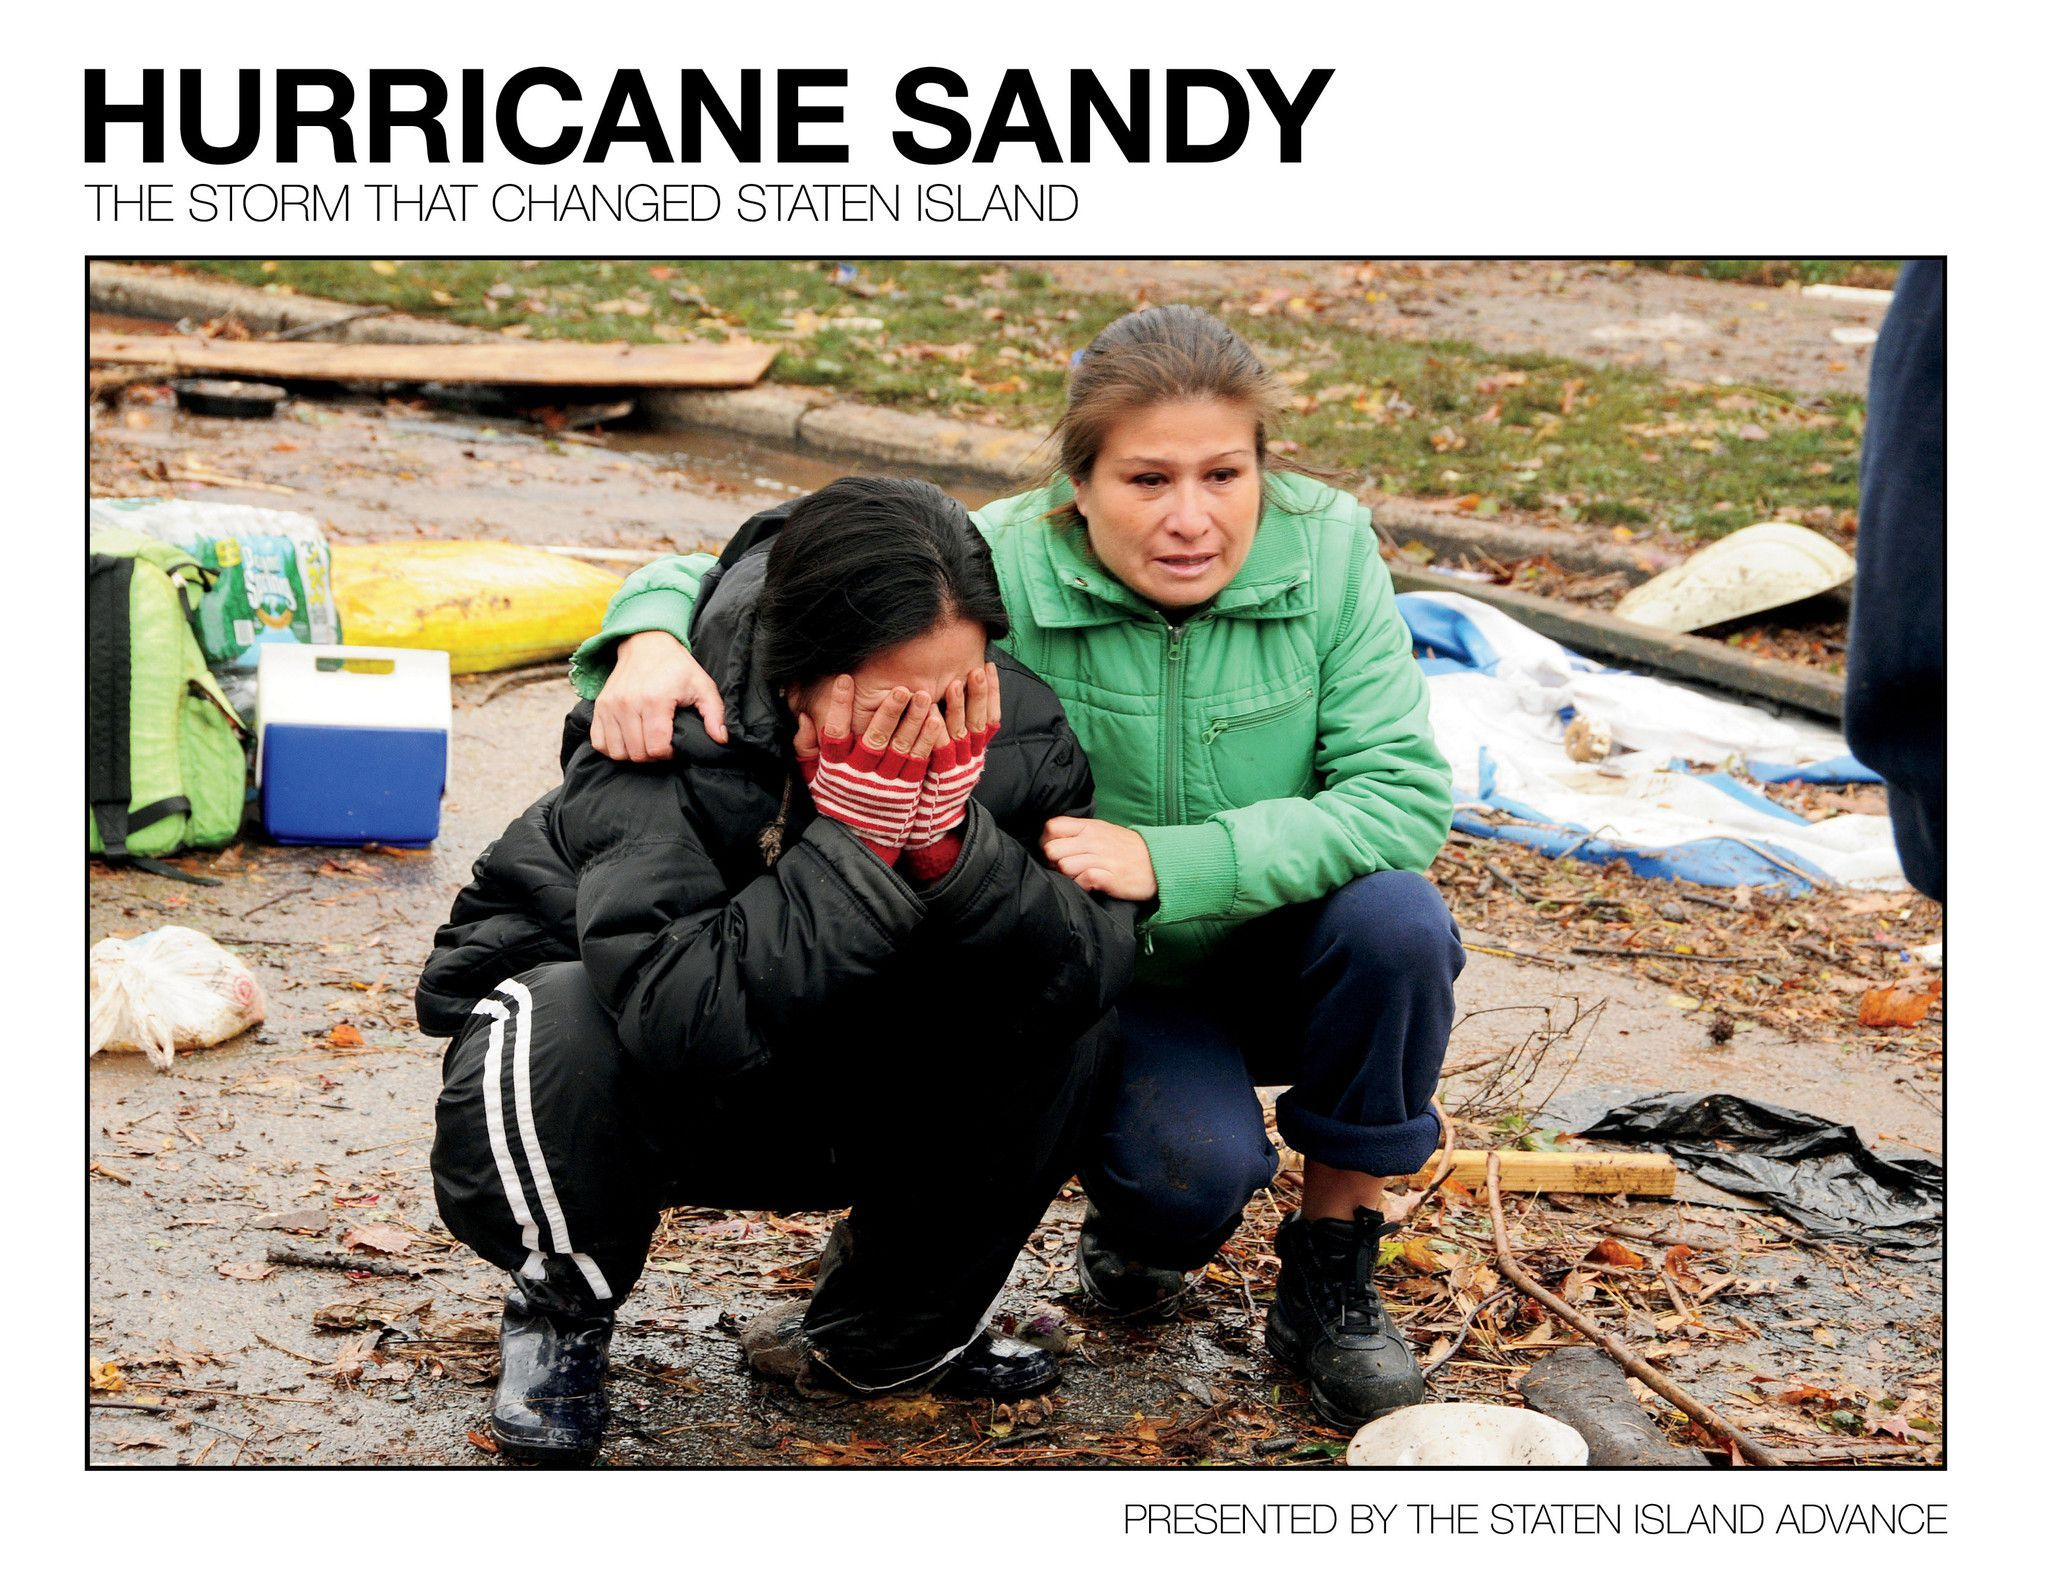 Hurricane Sandy: The Storm that Changed Staten Island